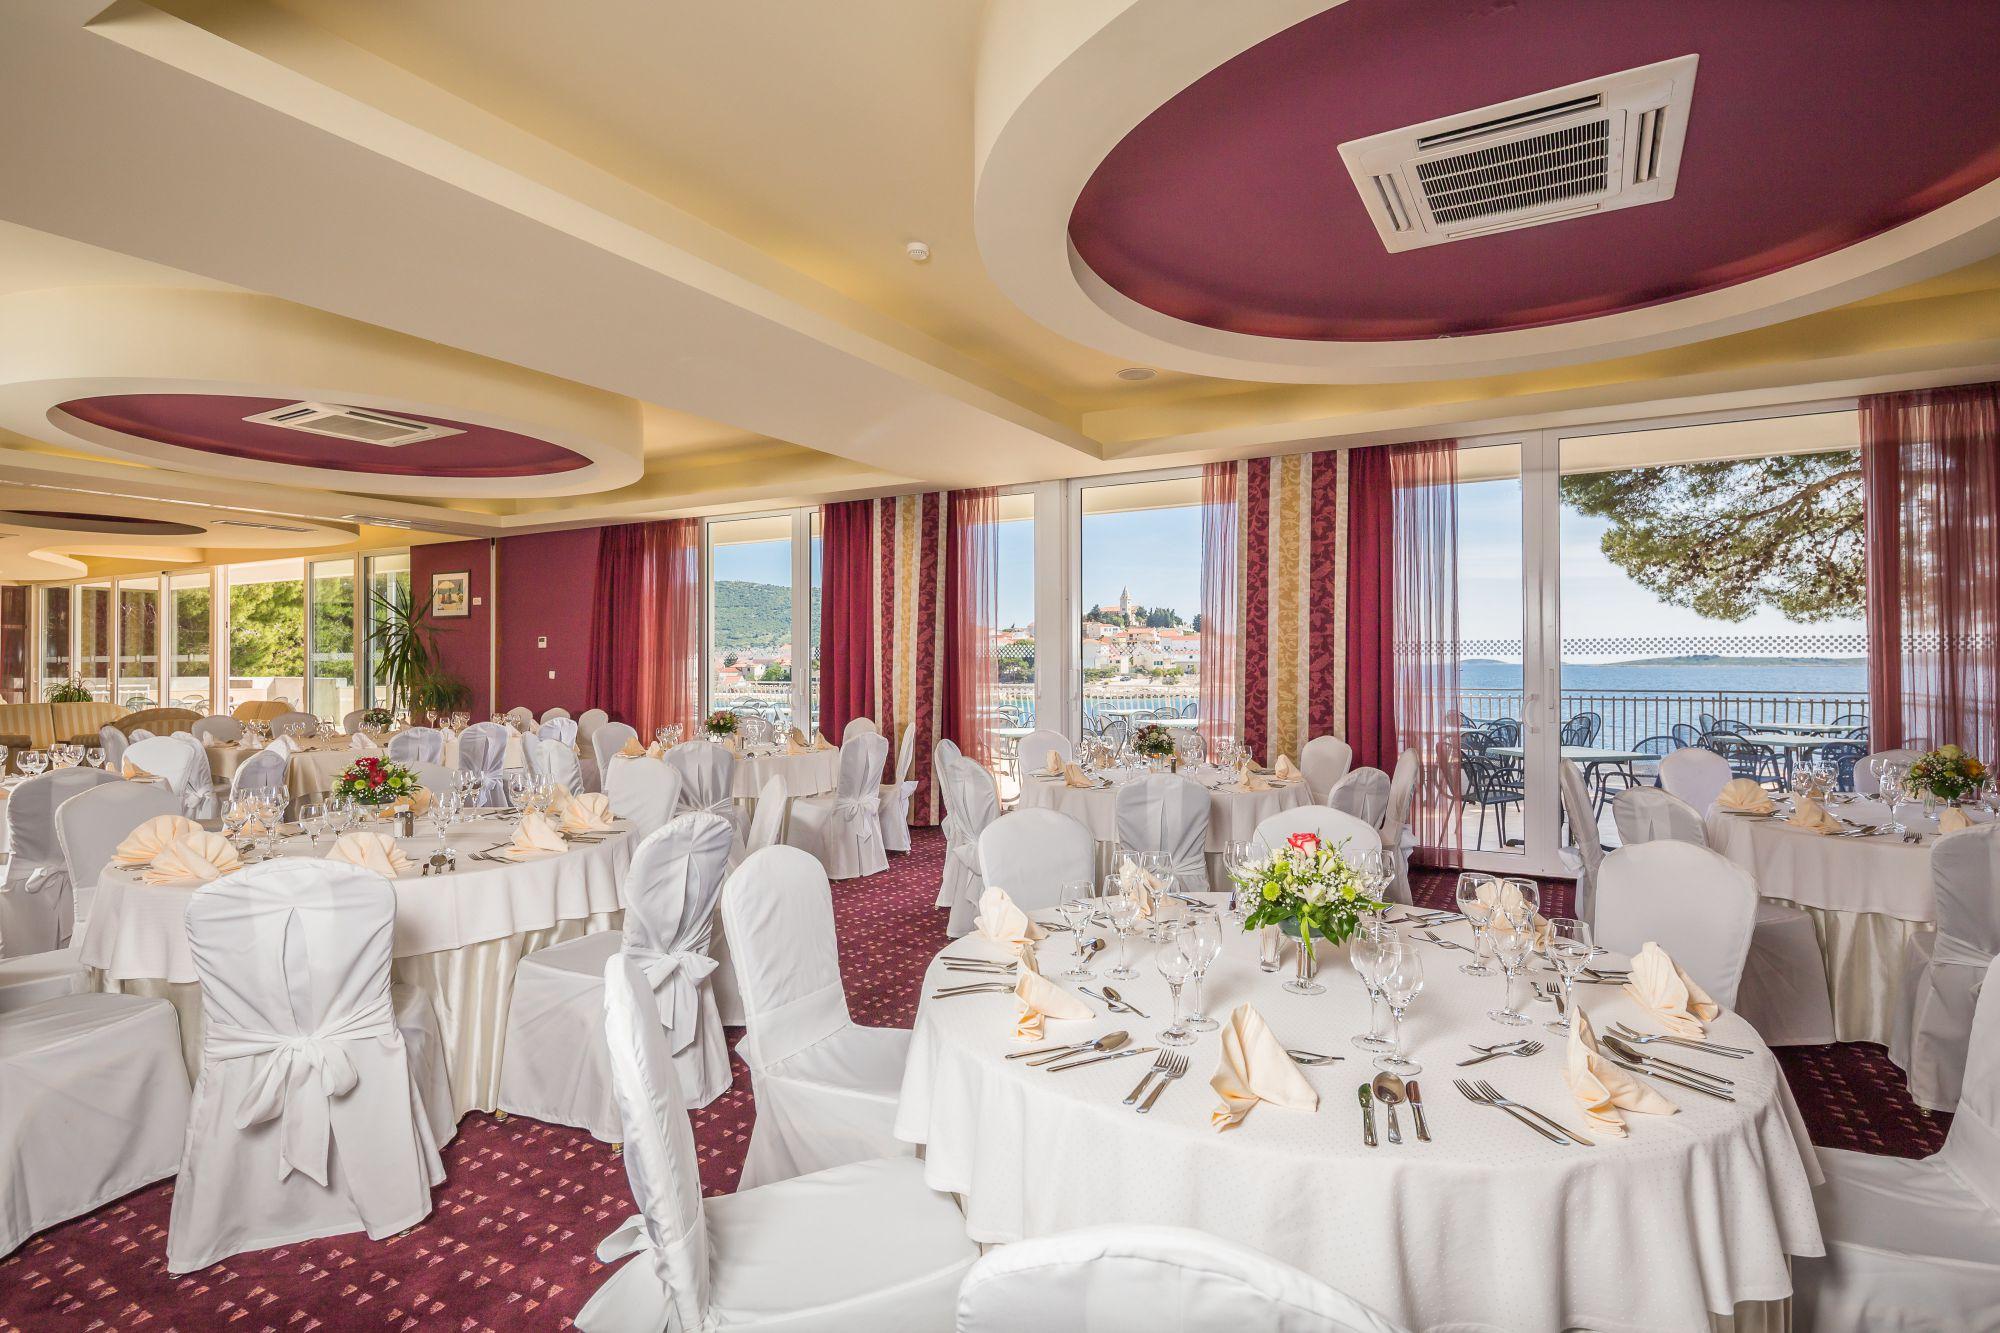 congress center gala dinner 02 14823042351 o - Zora Hotel